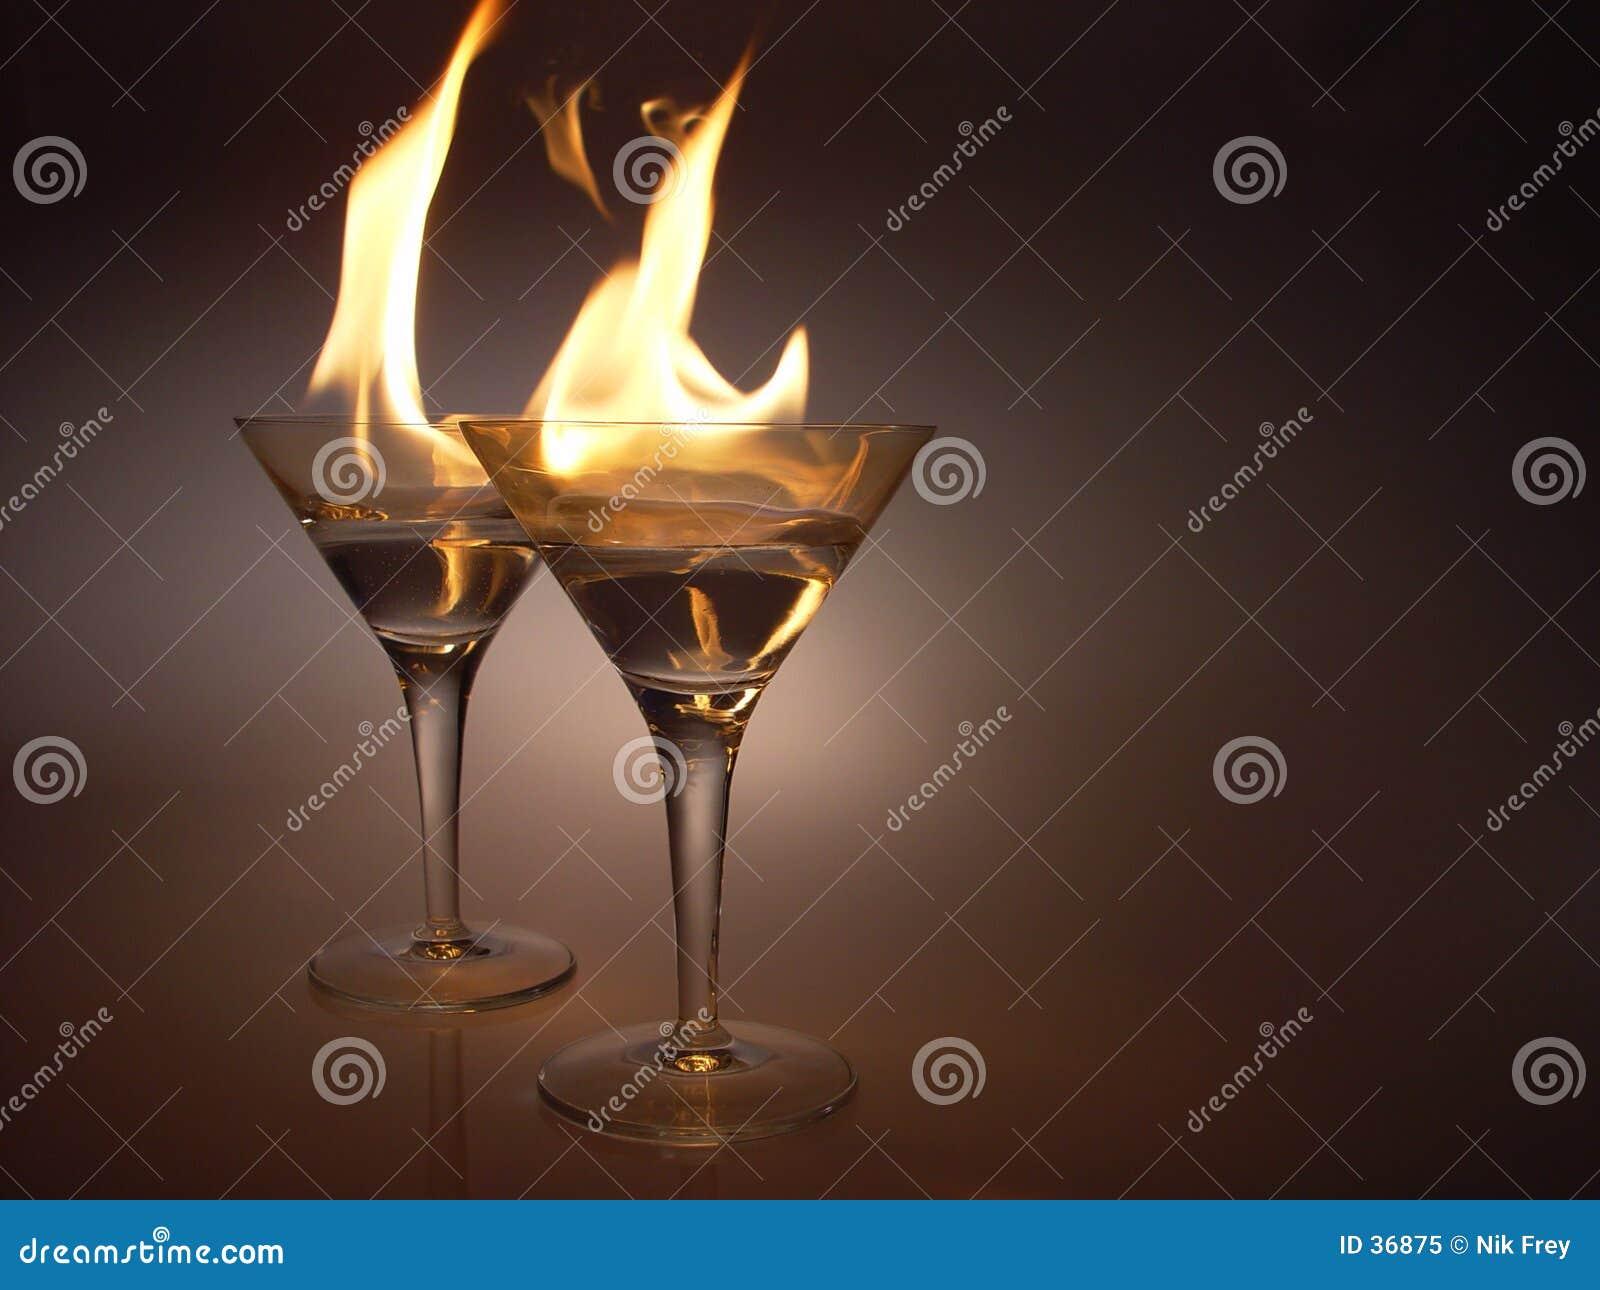 Firewater IV